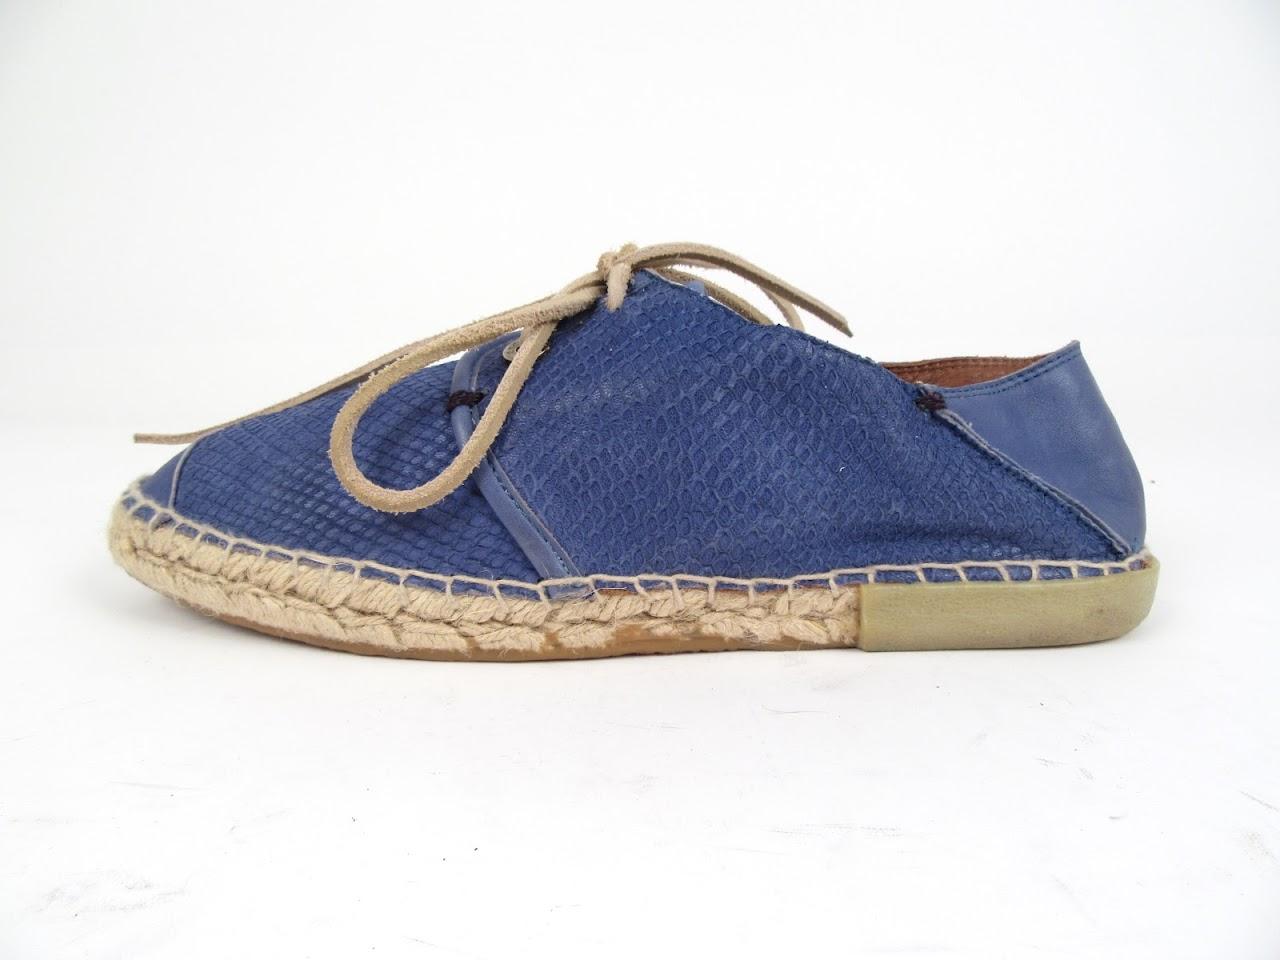 Jimmy Choo Snakeskin Embosses Espadrille Loafers